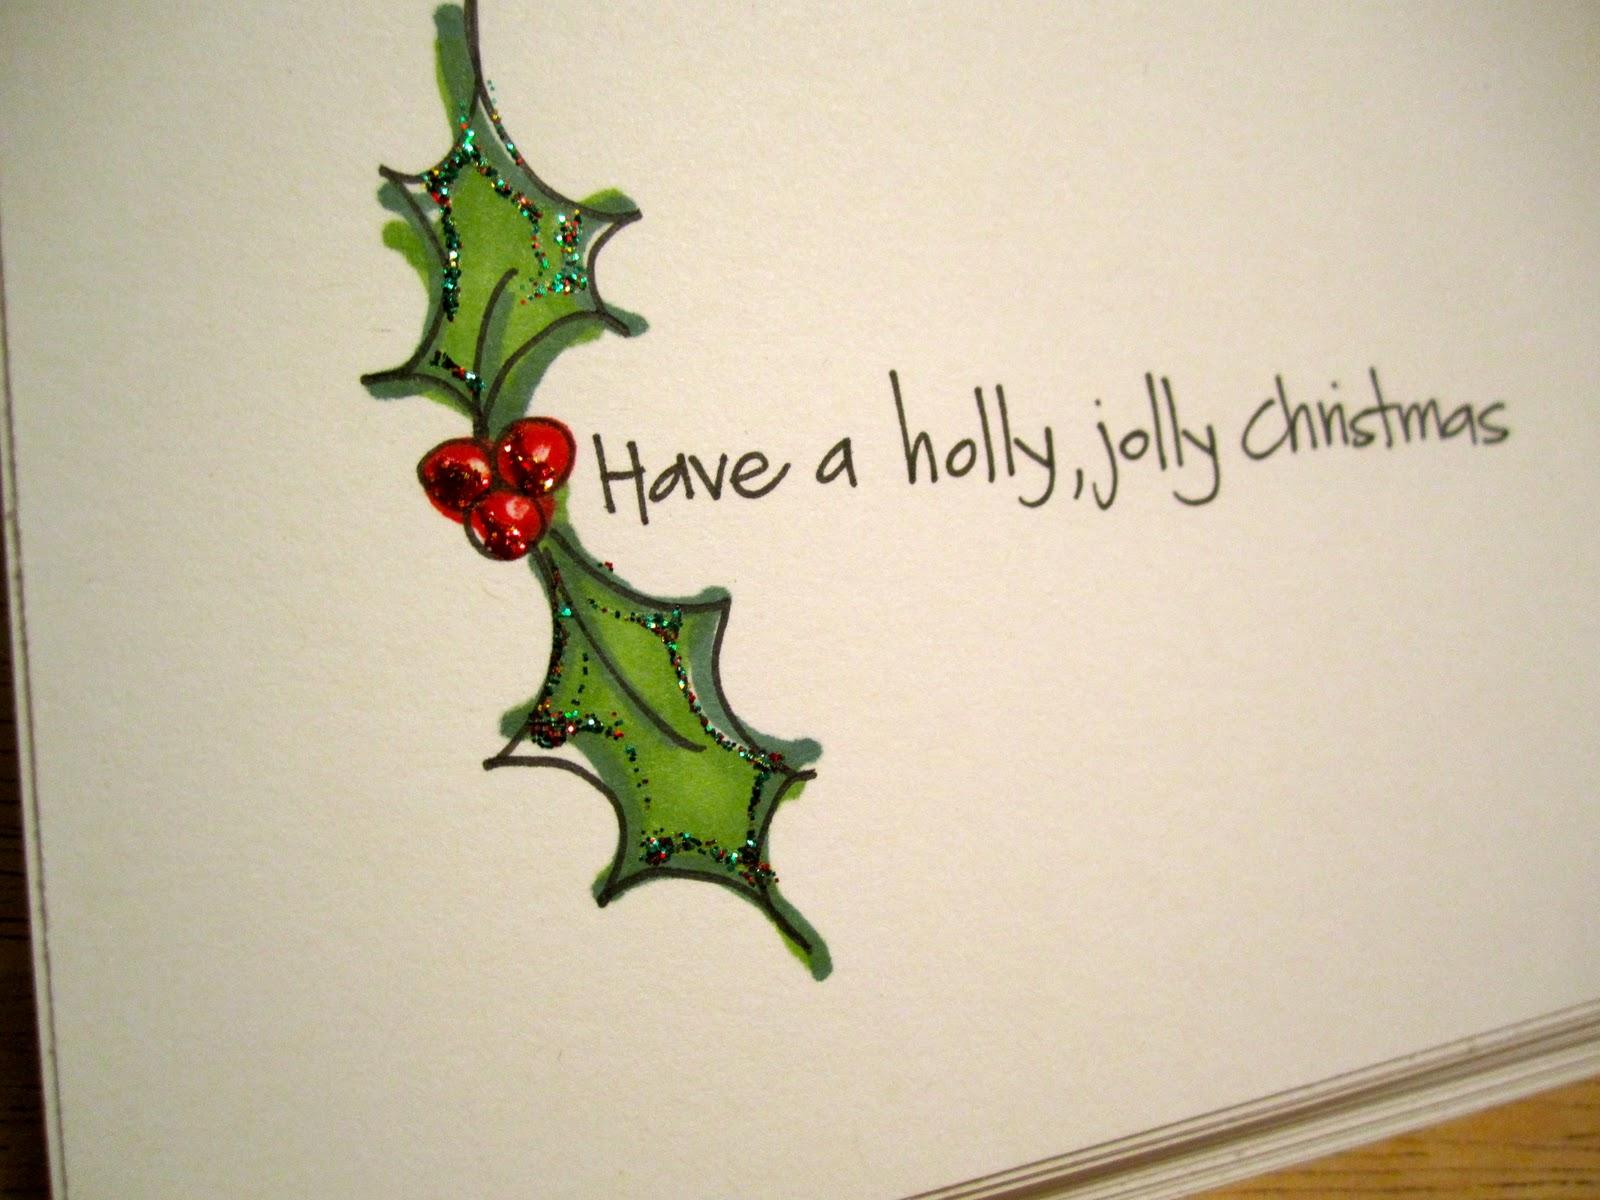 christmas cards 2012 holy - photo #47